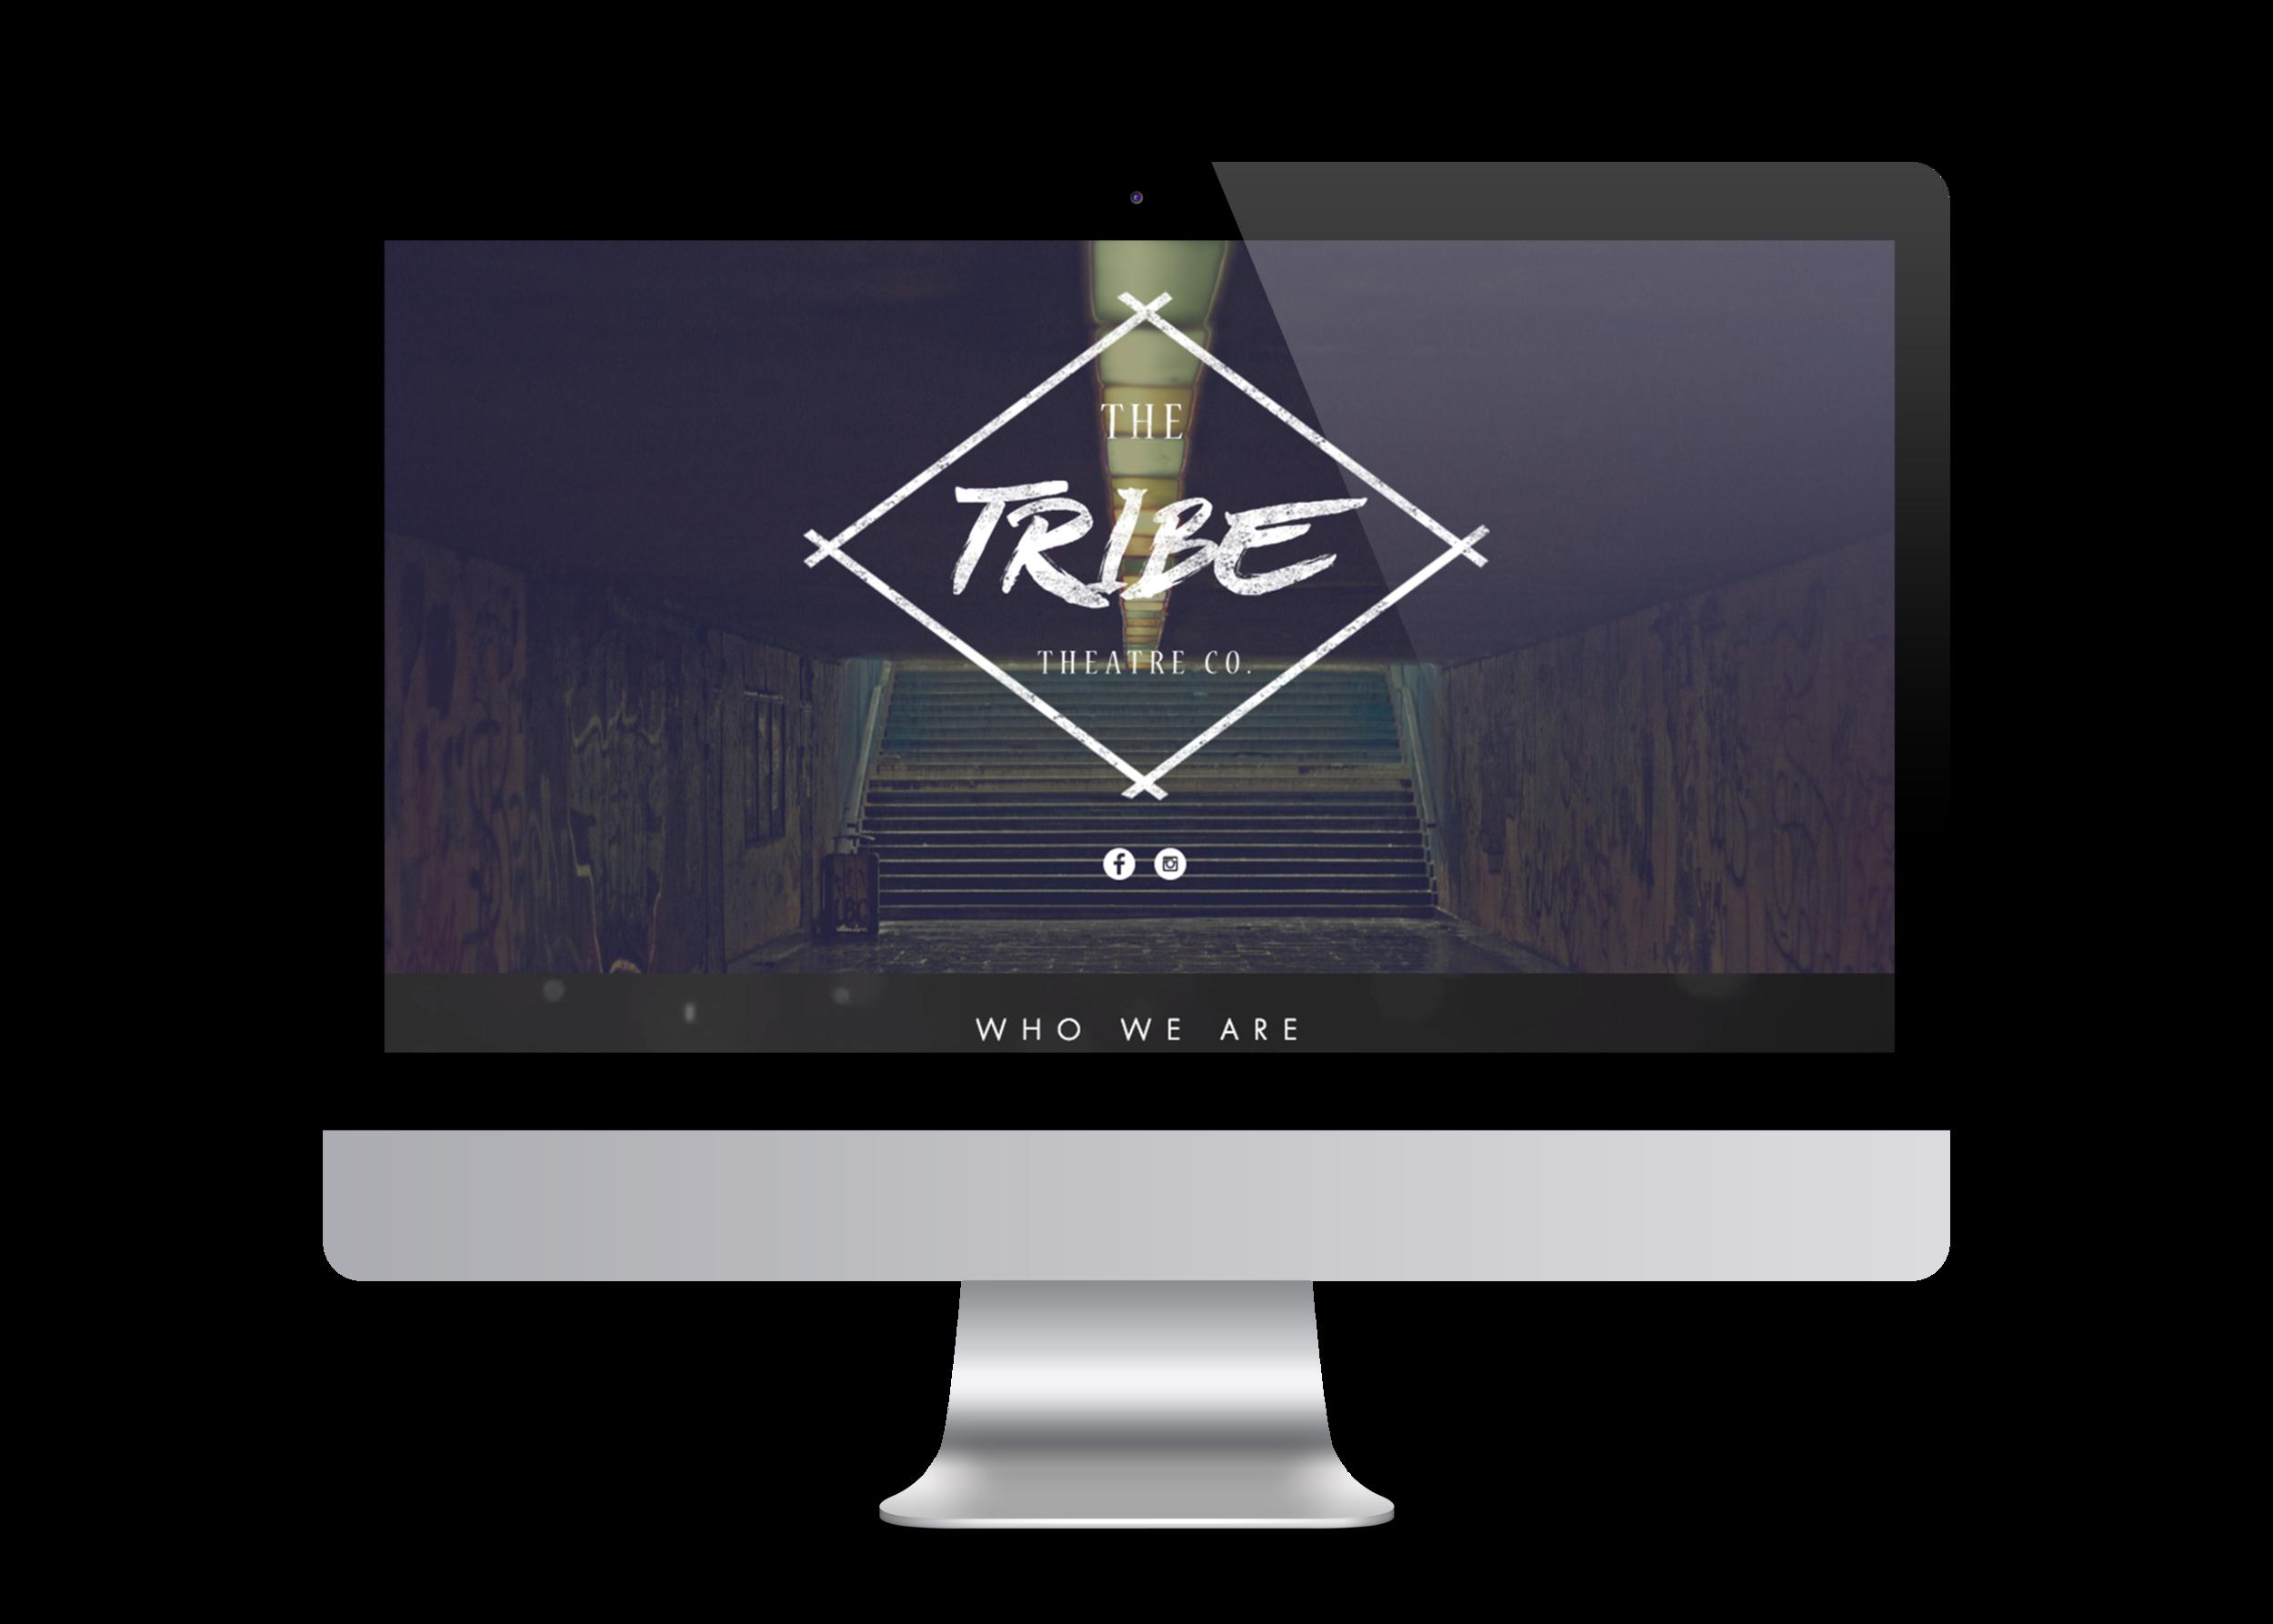 The Tribe Theatre Co.